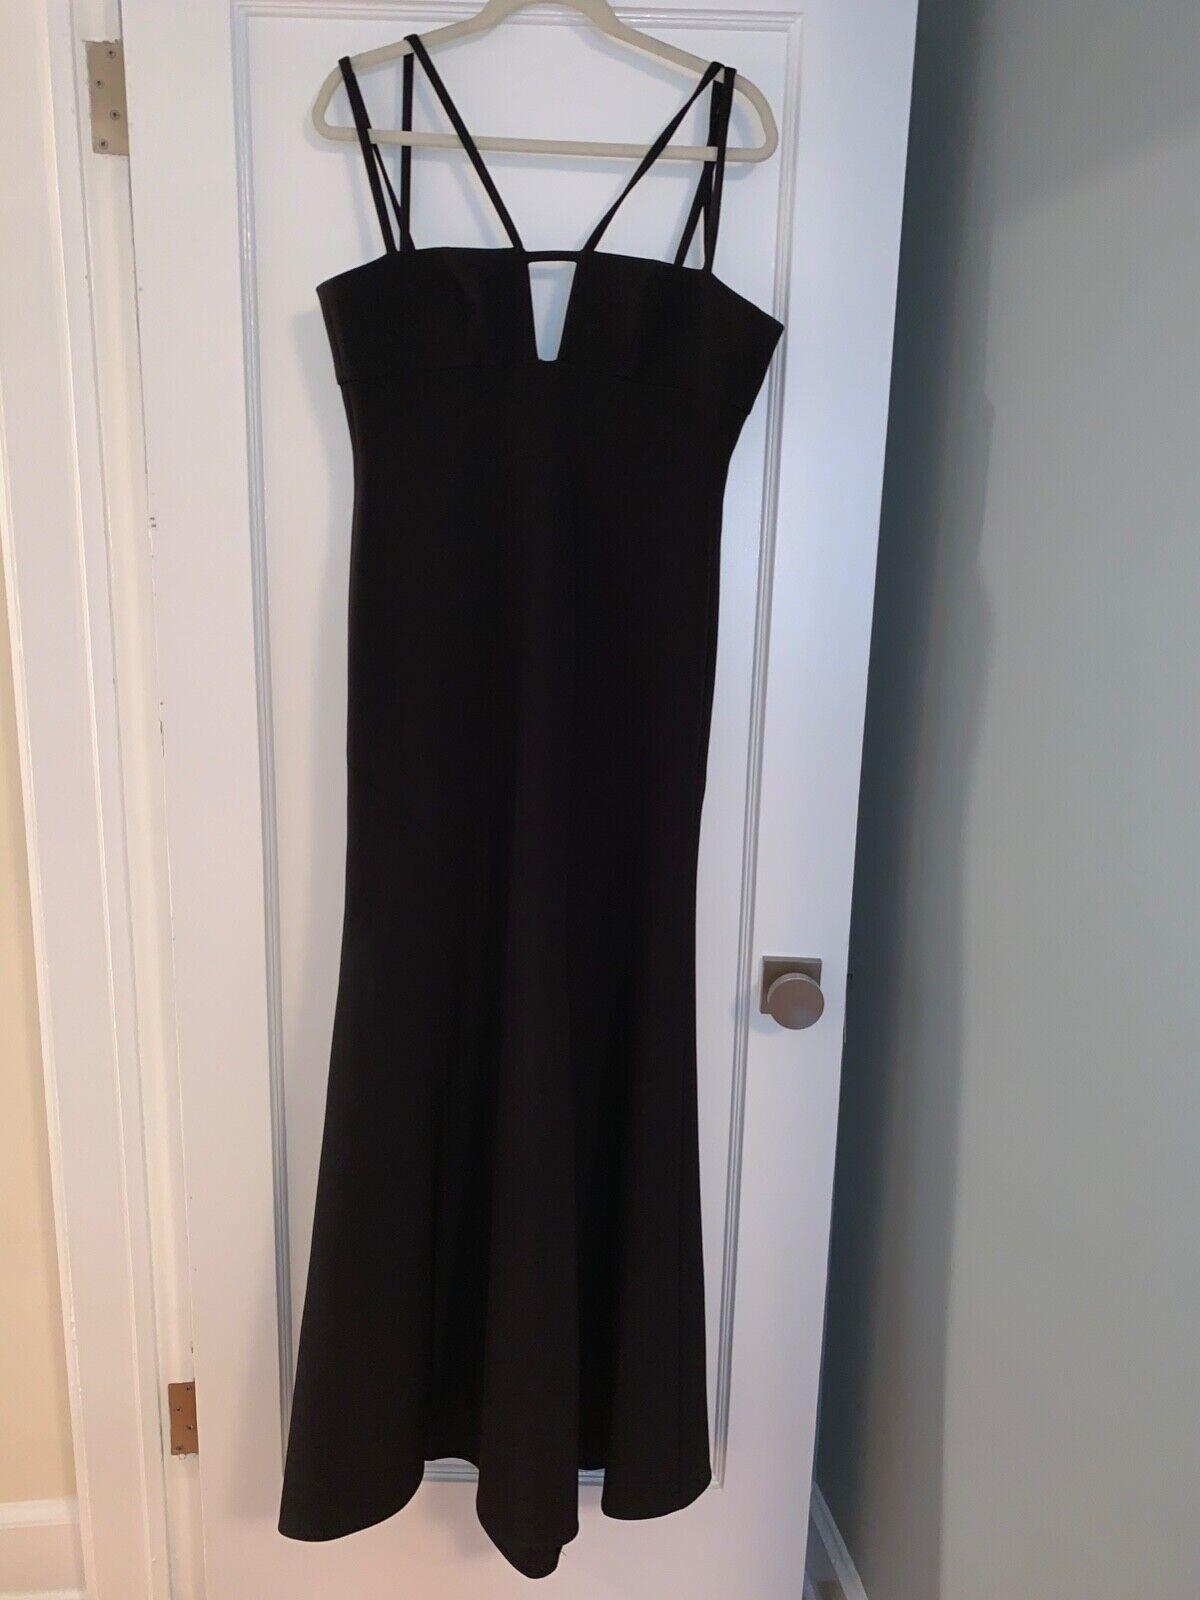 BCBG Max Azria Leola Double-Strap Cutout Gown, schwarz, Größe 6